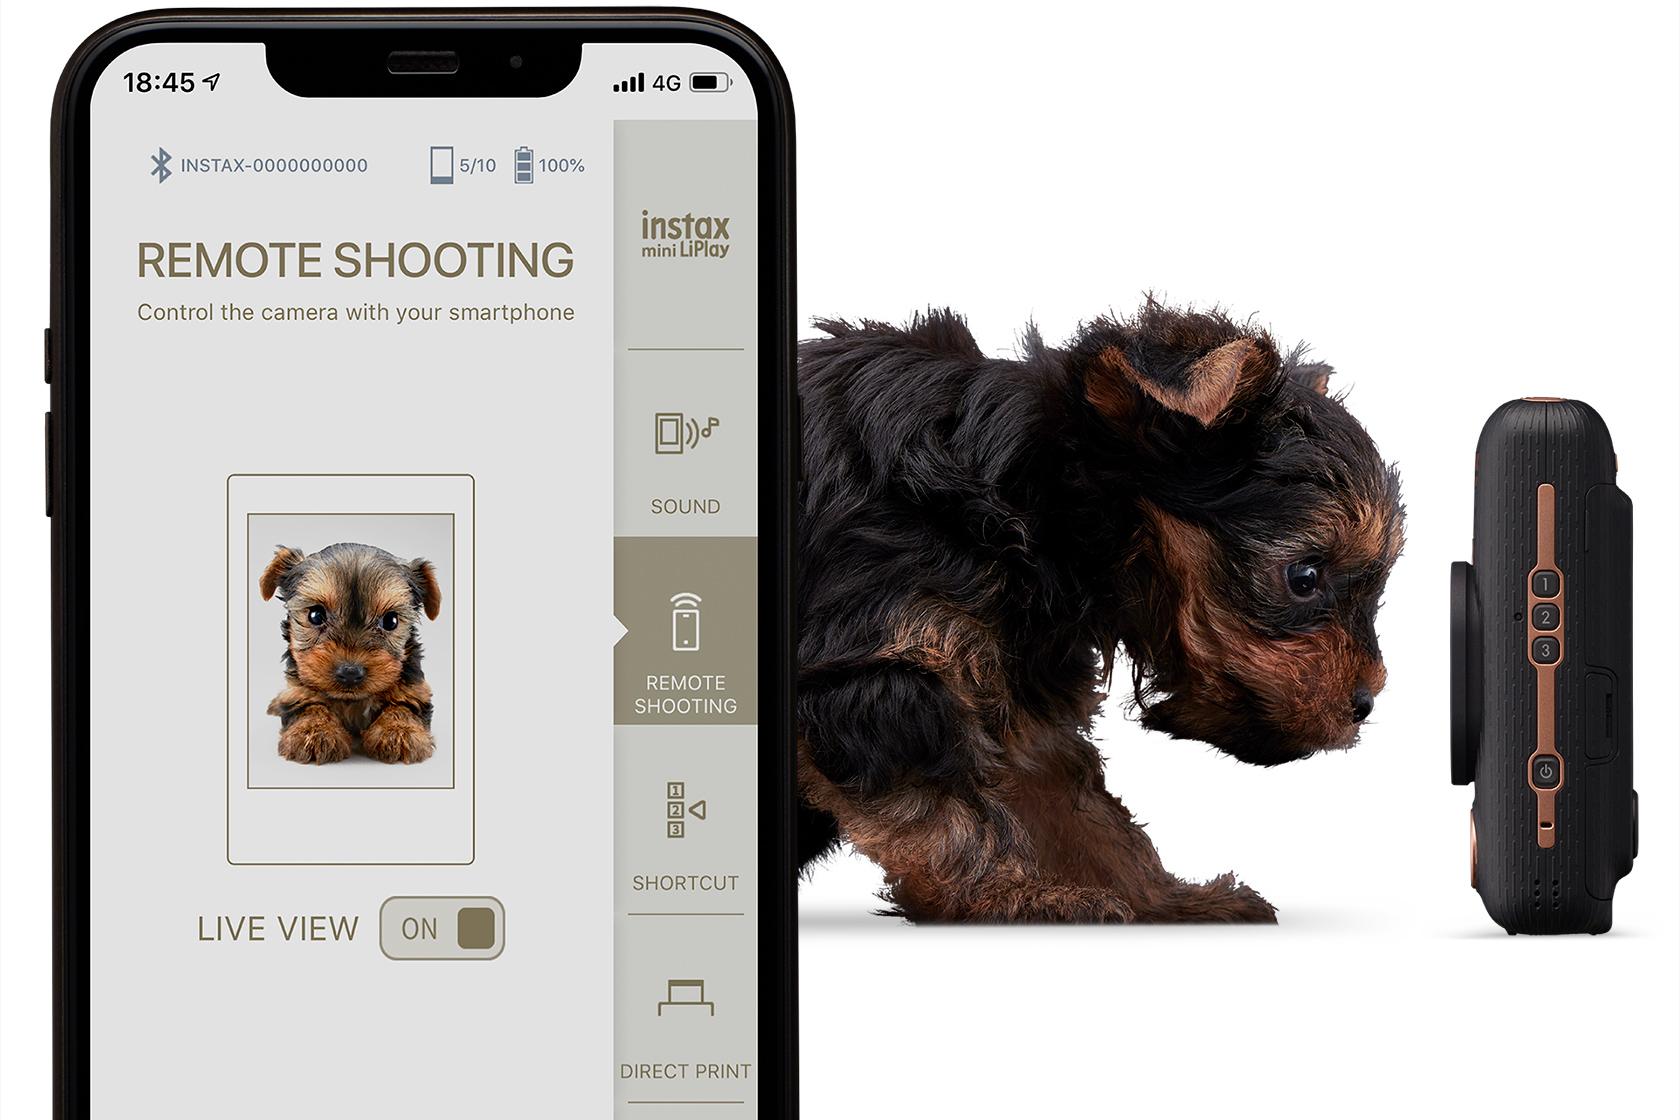 [photo] 강아지가 피사체로 있는 미니 리플레이 모바일 앱의 원격 촬영 사진